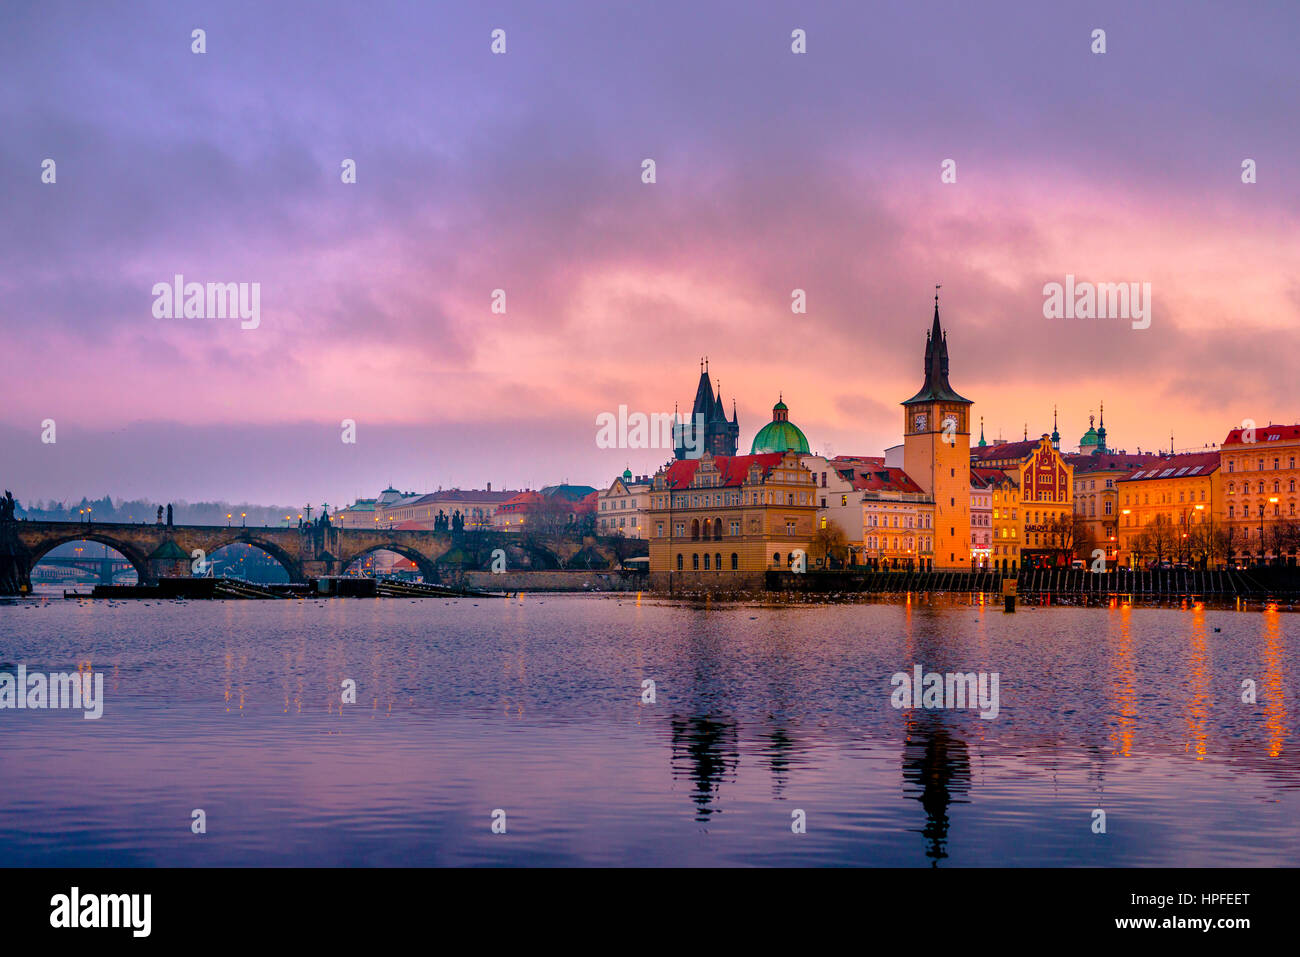 Vltava, Charles Bridge, la Torre del Ponte, sunrise, centro storico, Praga, Boemia, Repubblica Ceca Immagini Stock